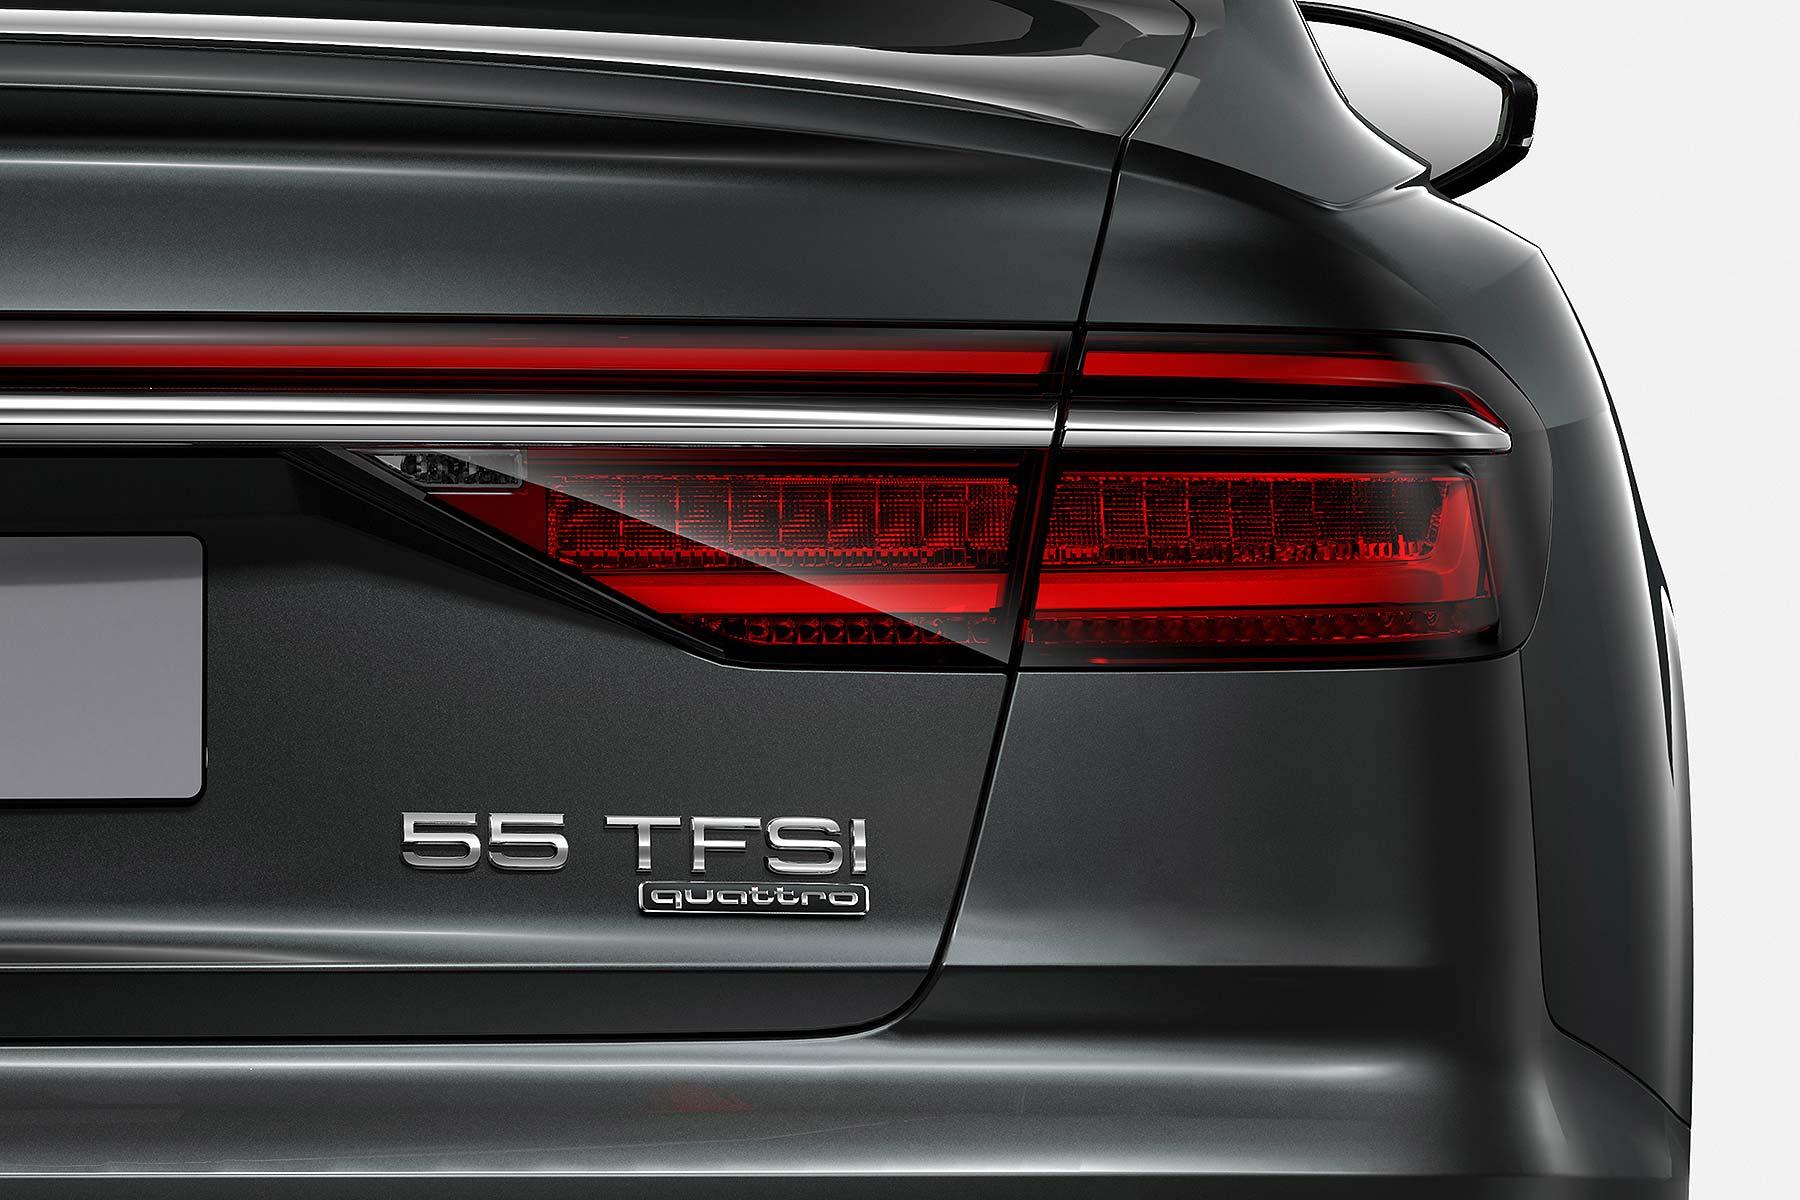 Audi power badge